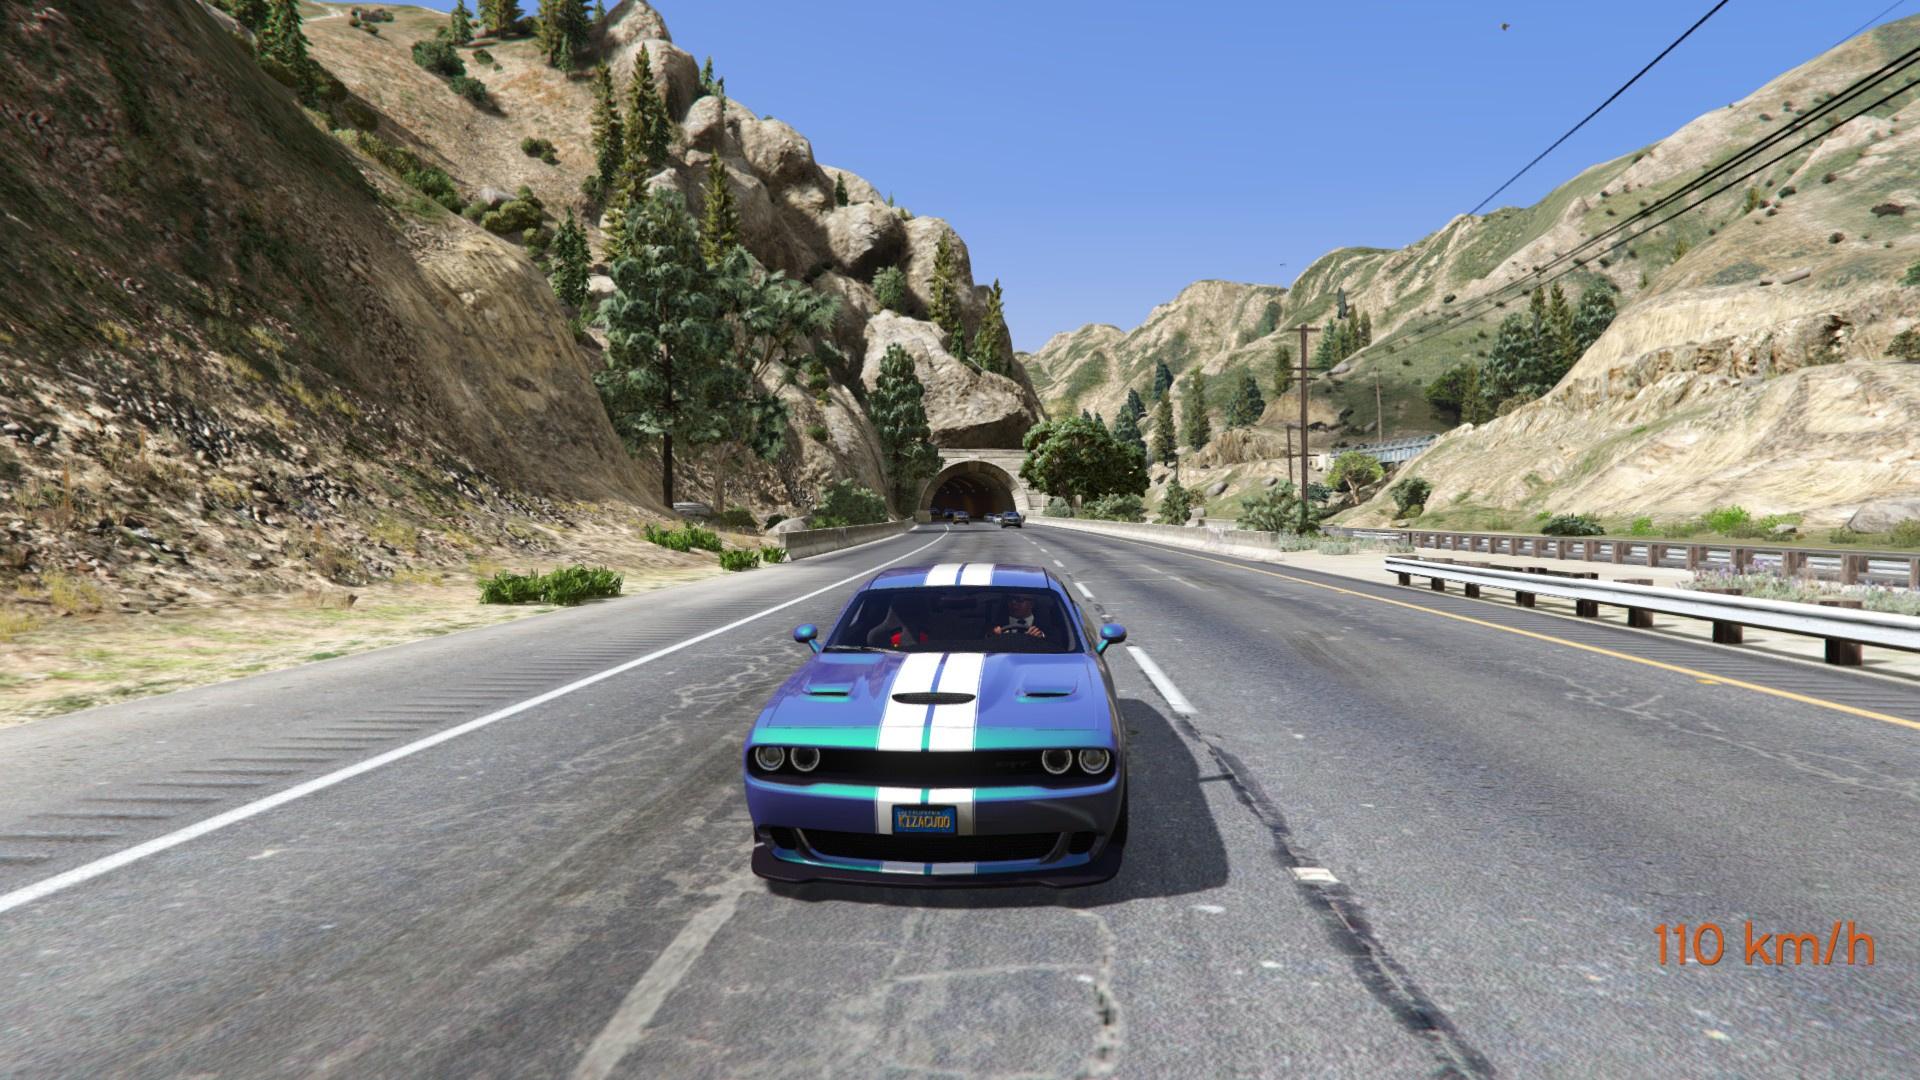 Dodge Challenger 2015 Hellcat Paintjobs (Alex9581 & p4elkin) - GTA5 ...